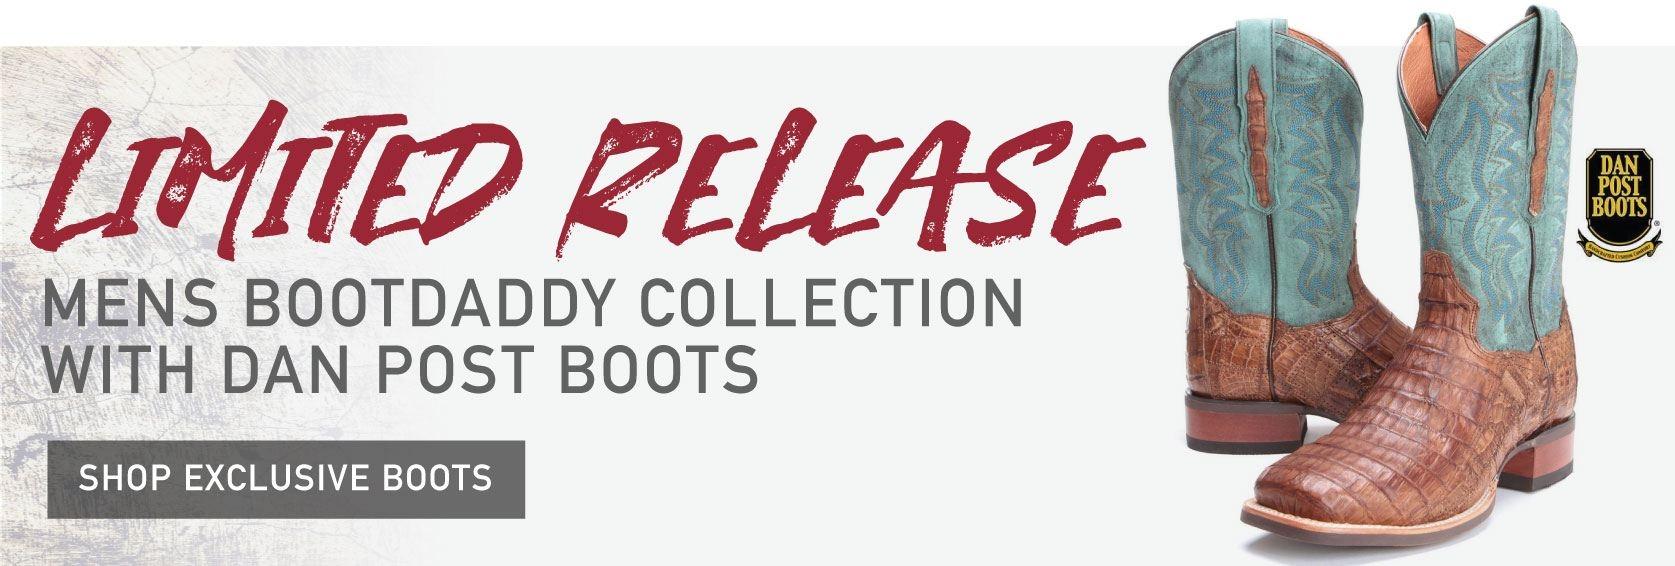 Dan Post BootDaddy Cowboy Boots